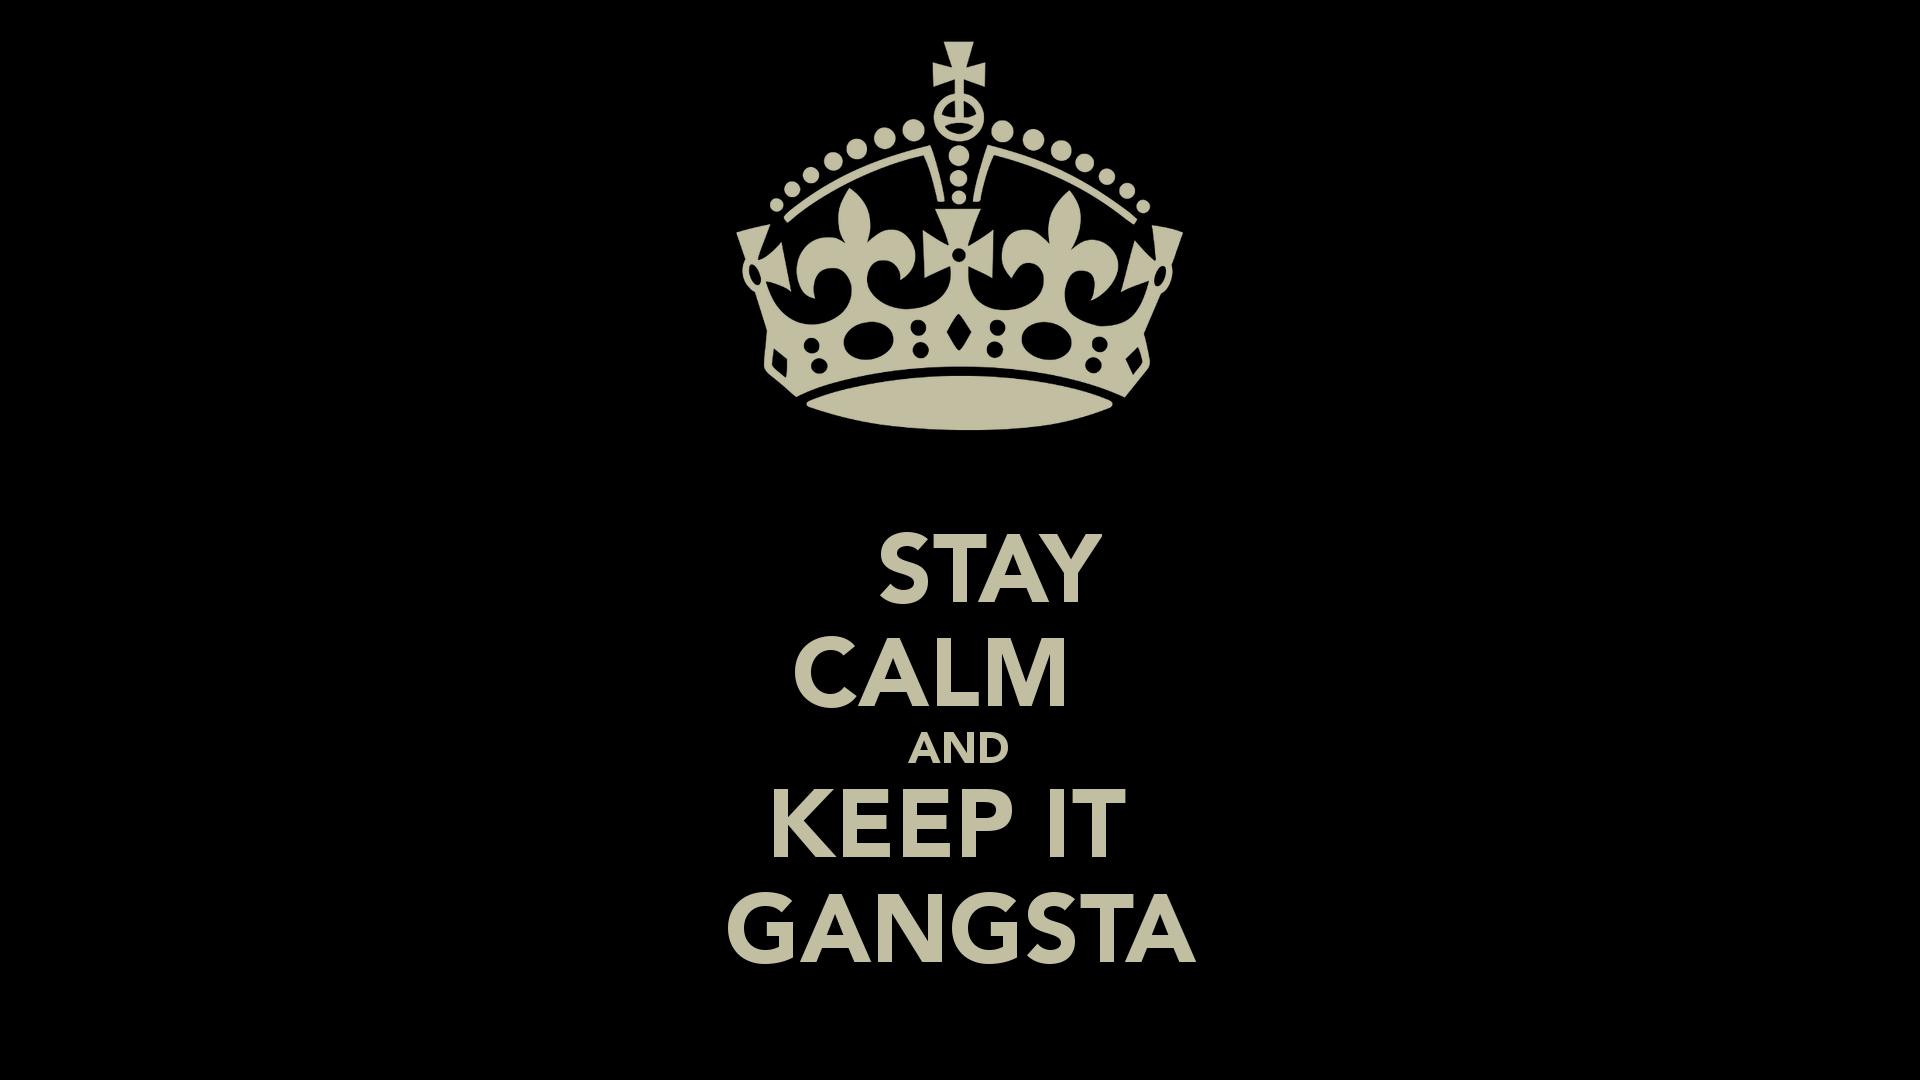 gangsta wallpapers wallpaper cave